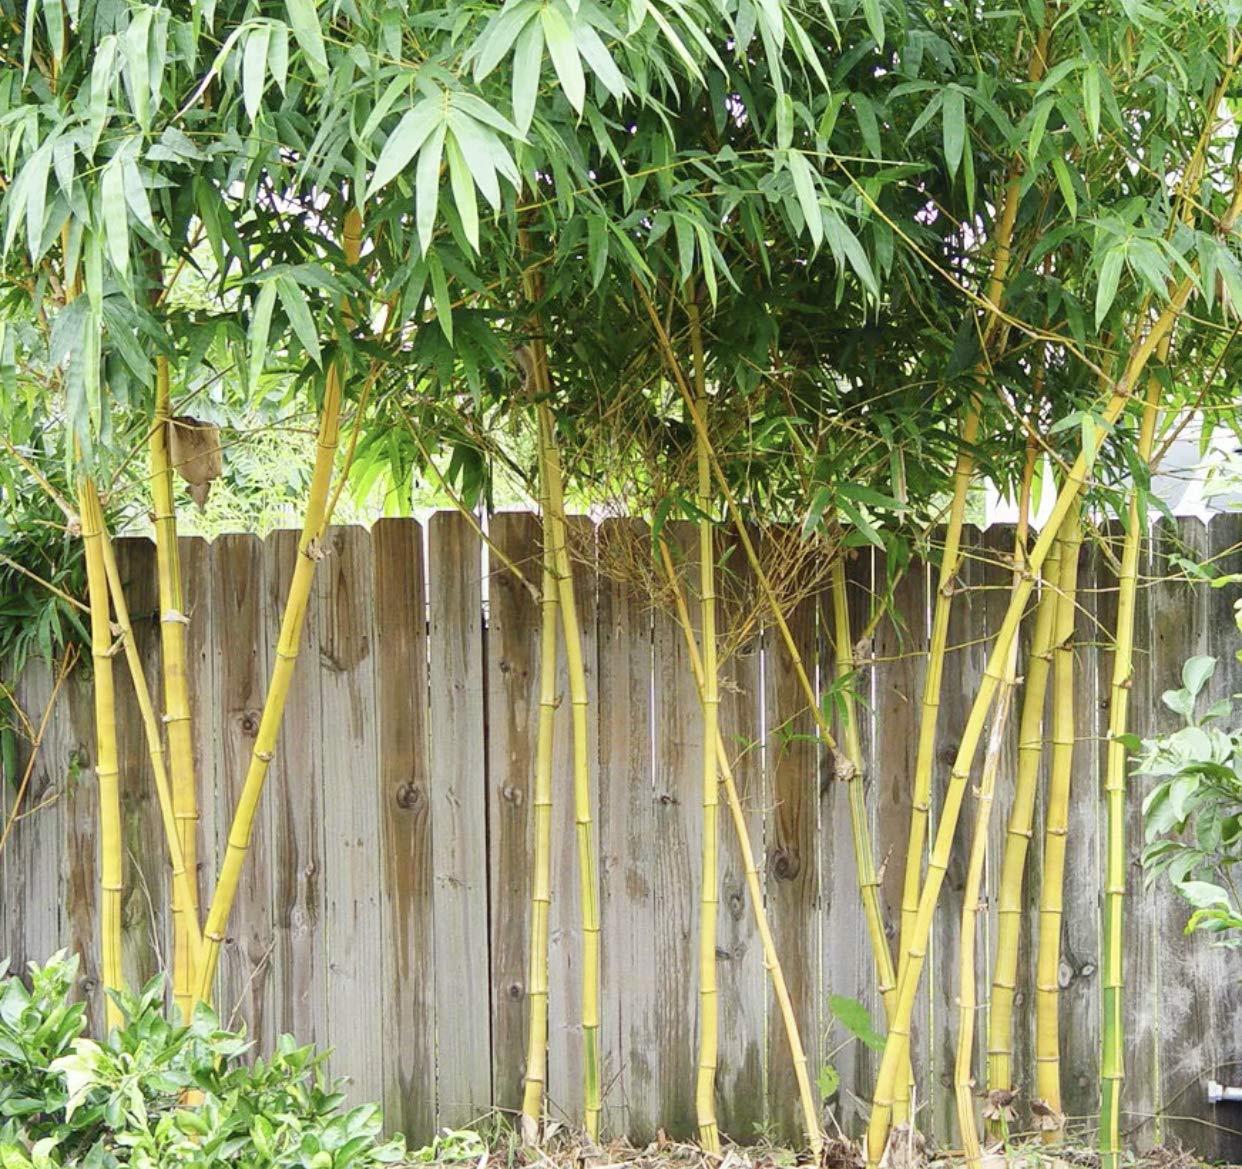 Amazon.com: Grasas ornamentales de bambú gruesas de pared ...